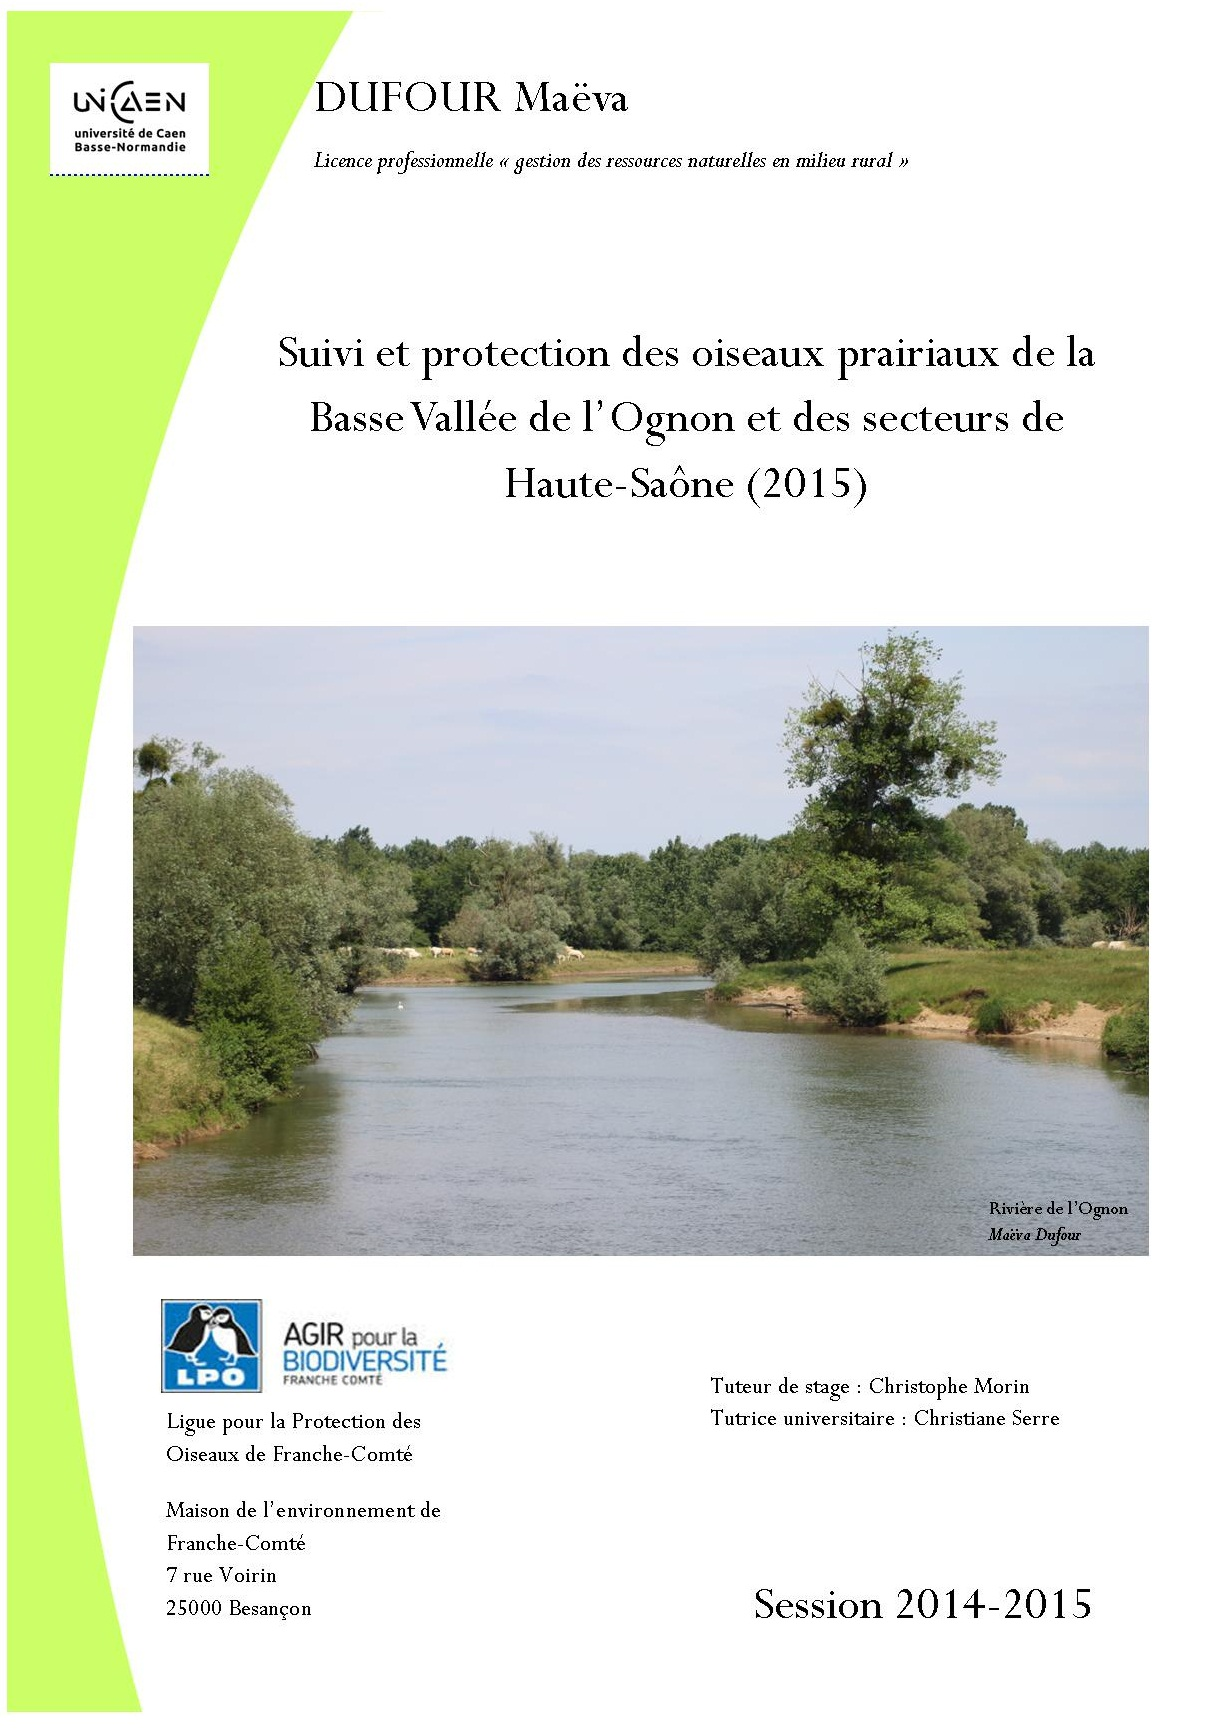 https://cdnfiles2.biolovision.net/franche-comte.lpo.fr/userfiles/publications/rapportsstages/2015RapportPRCEOisprairiauxMavaDufourcouv.jpg